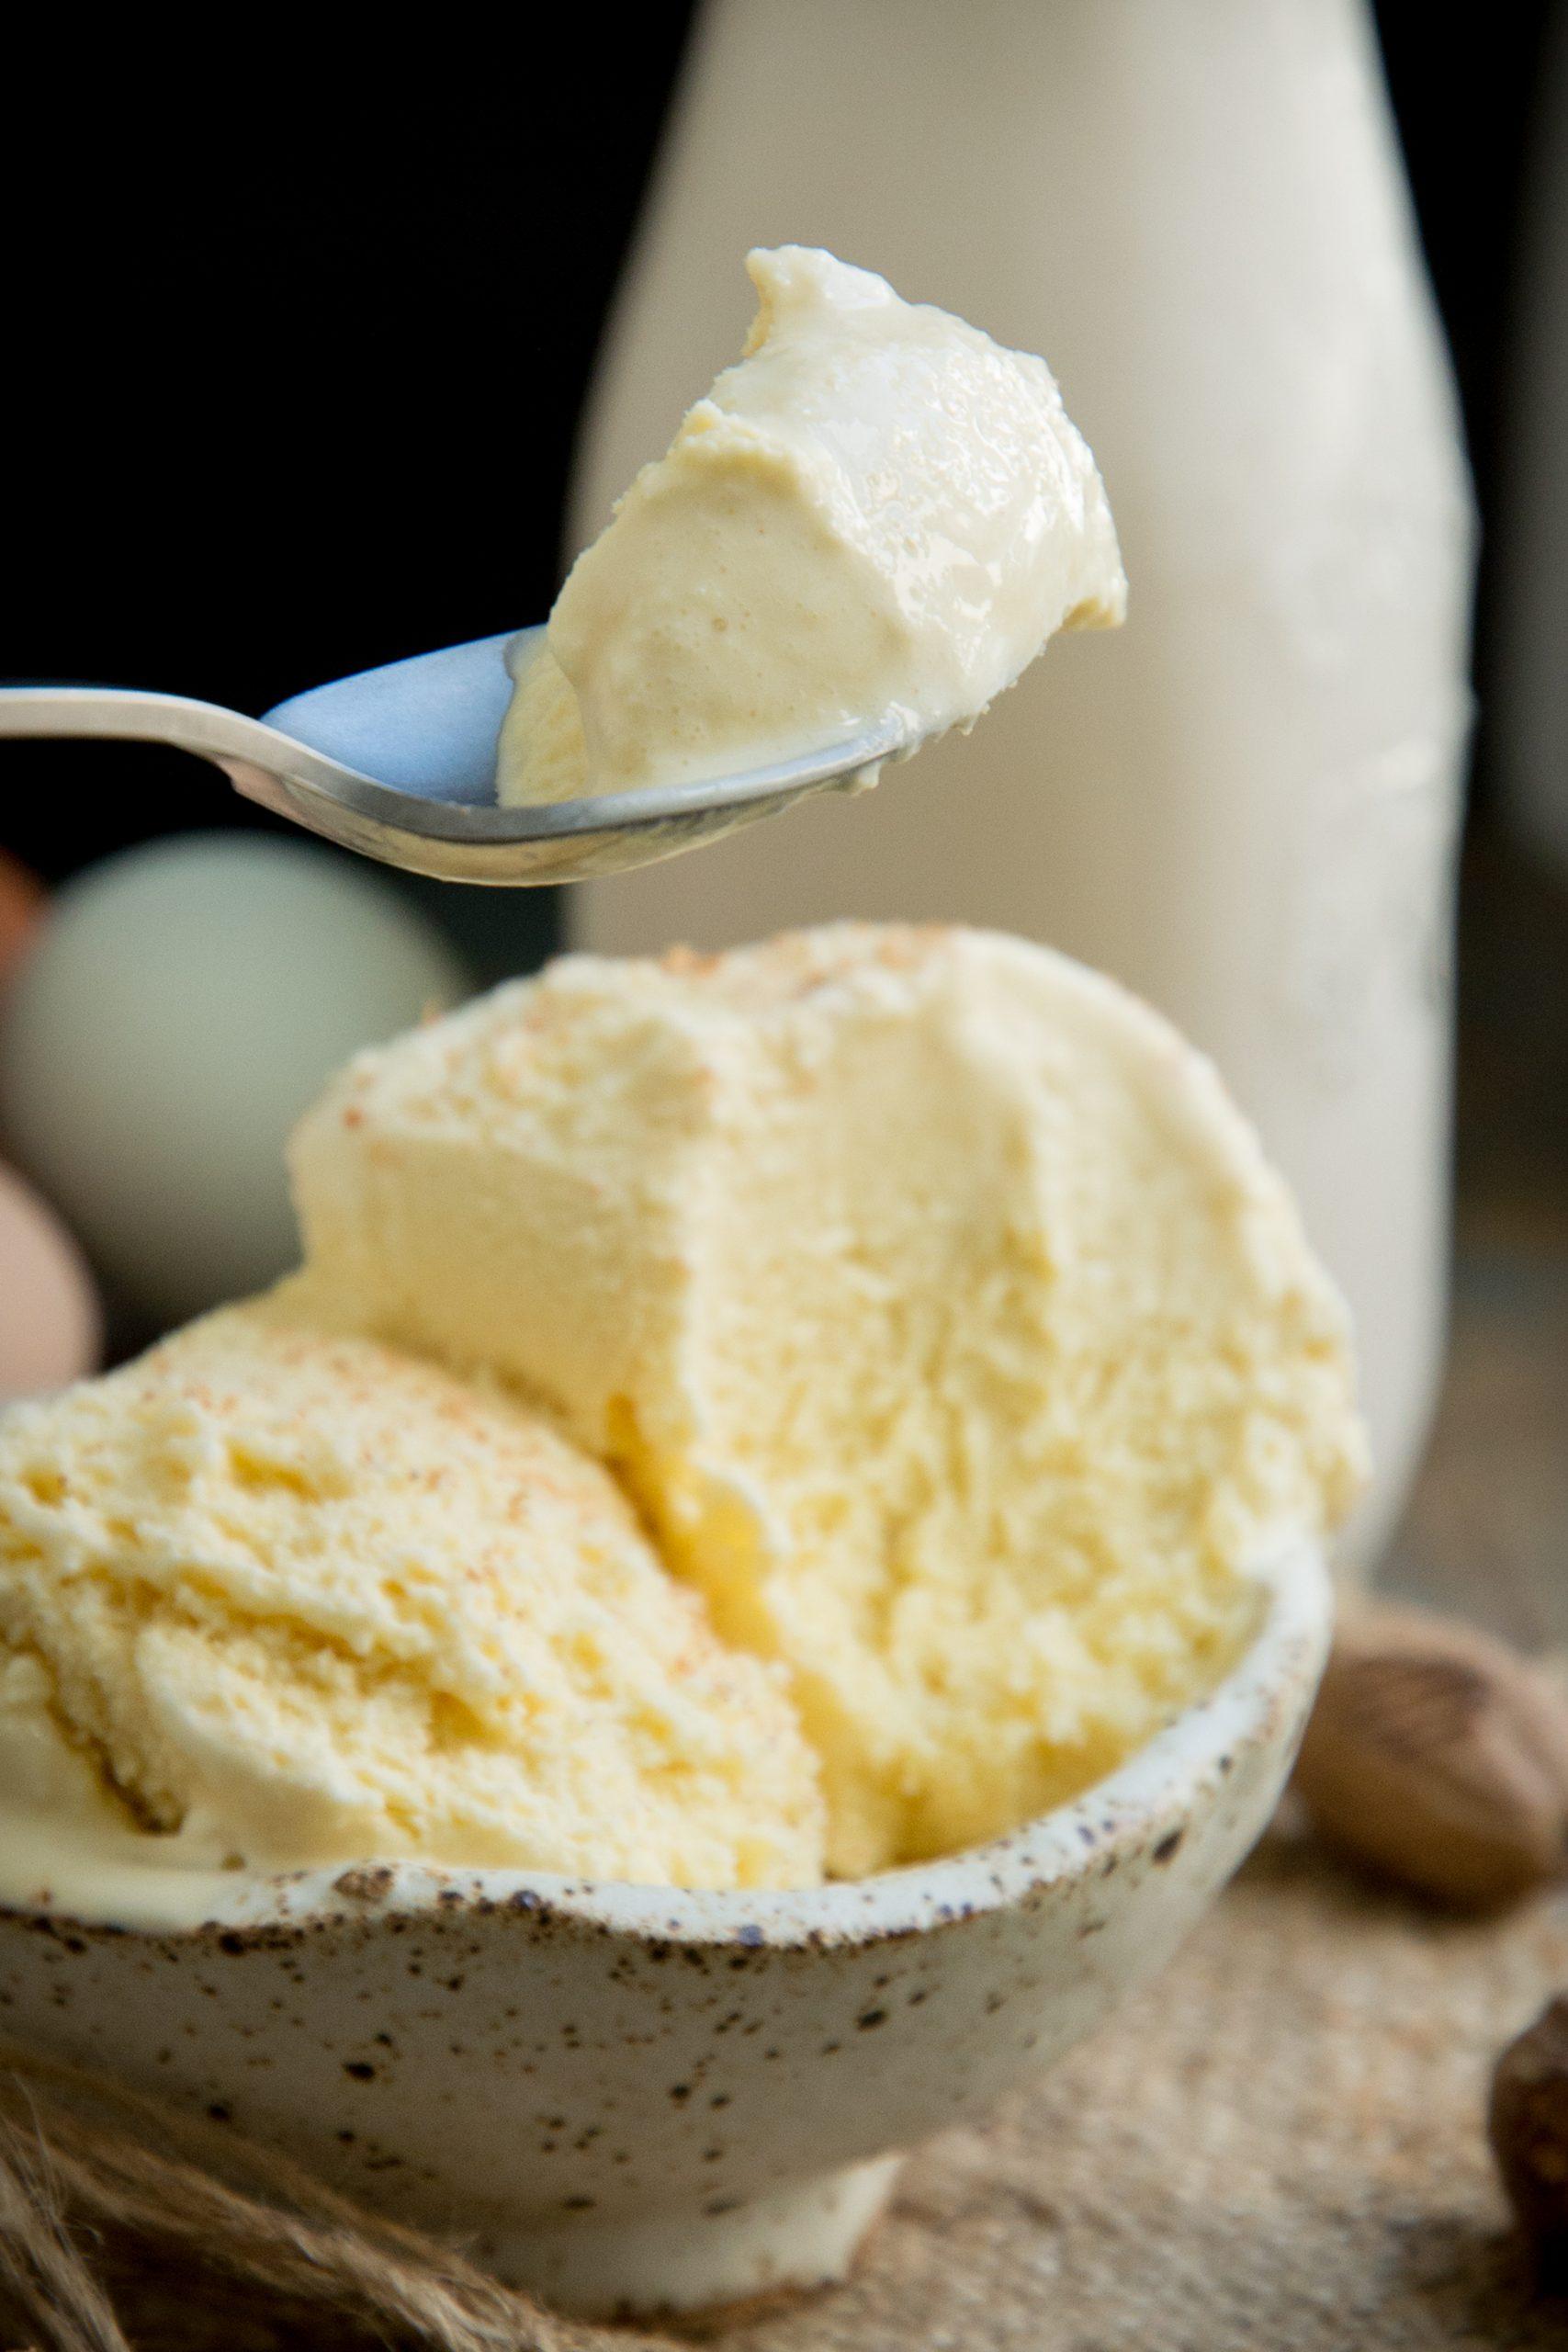 Taking a spoonful of keto eggnog ice cream.